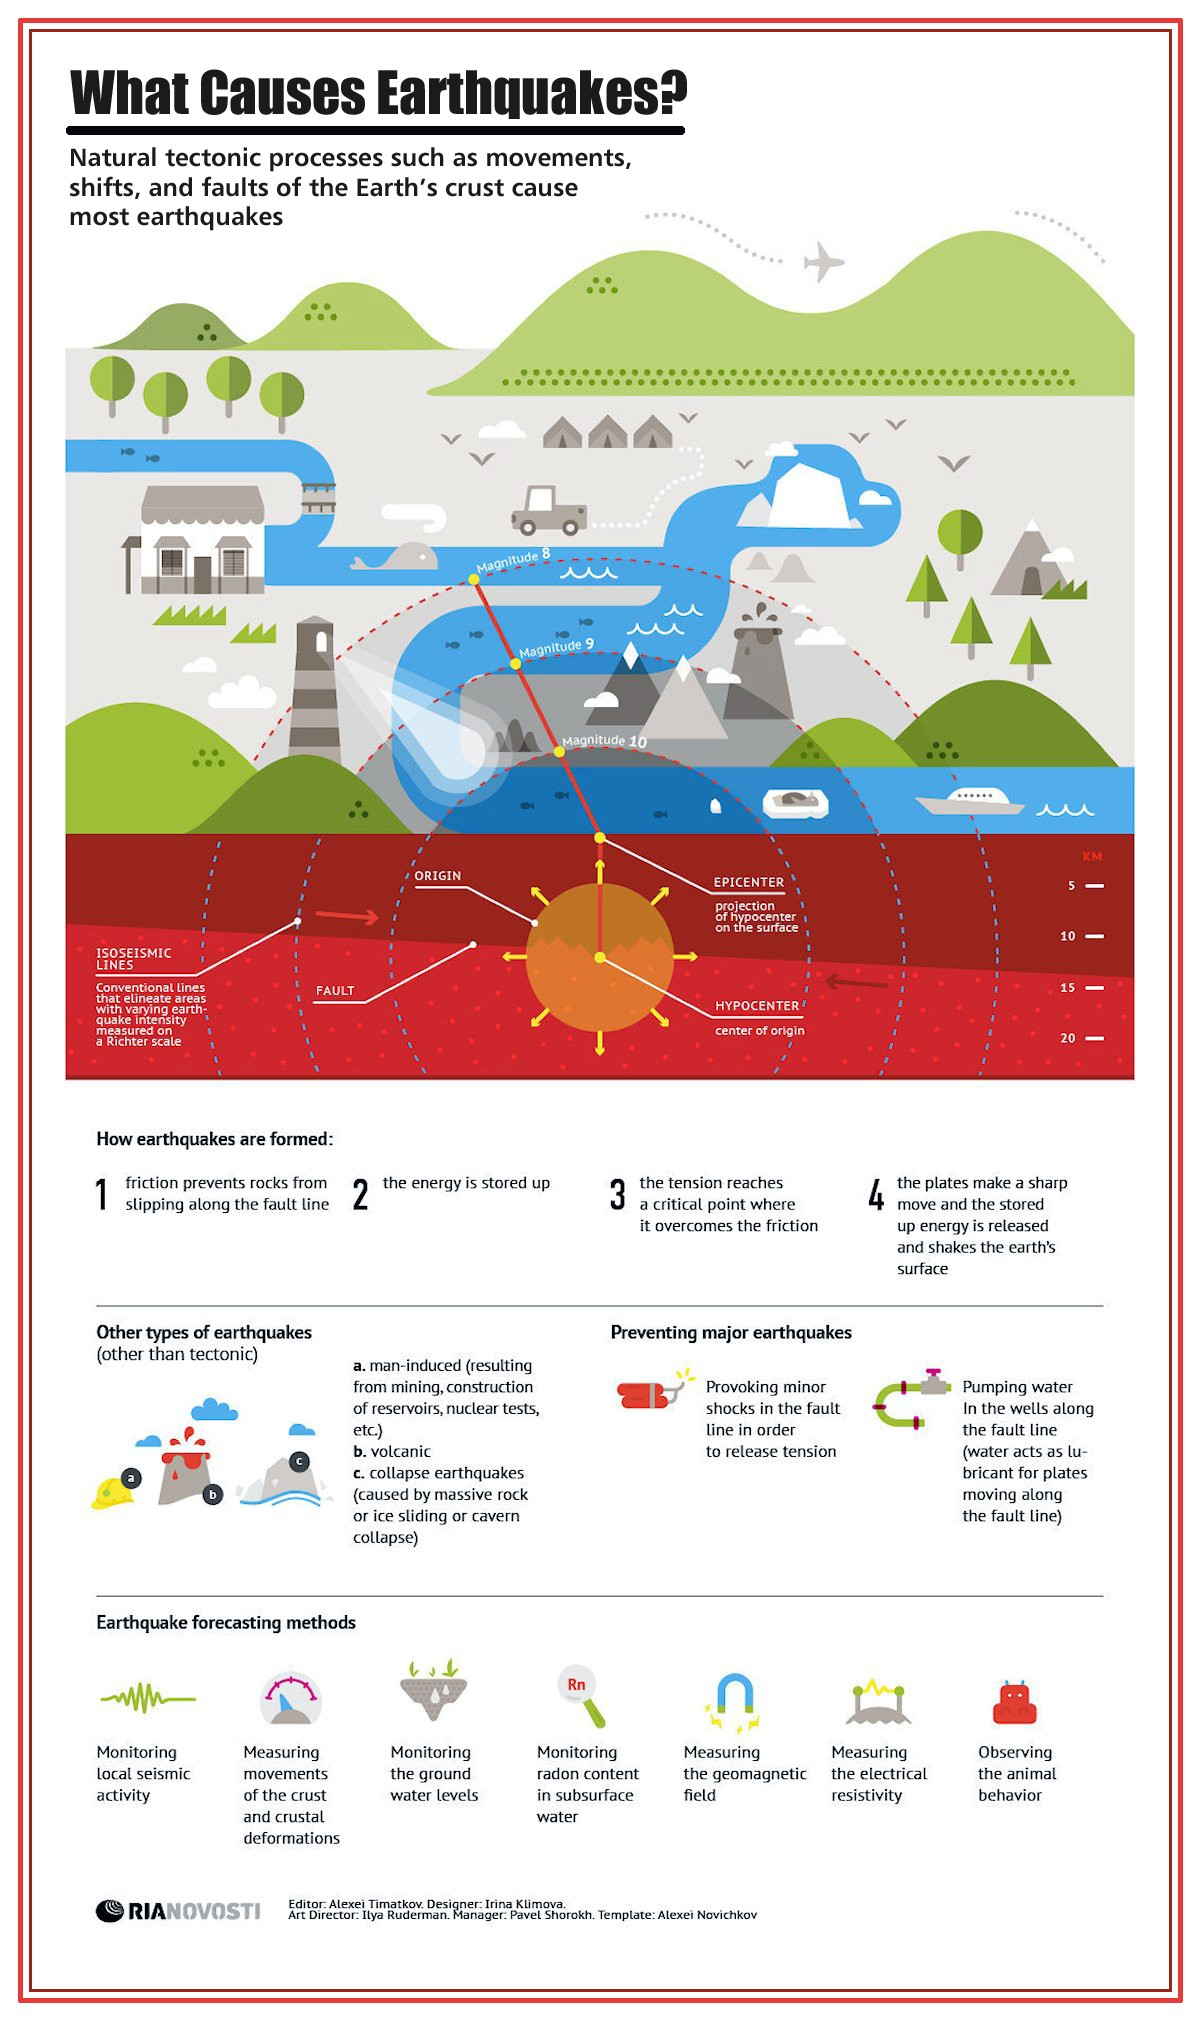 00 RIA-Novosti Infographics. What Causes Earthquakes. 2013